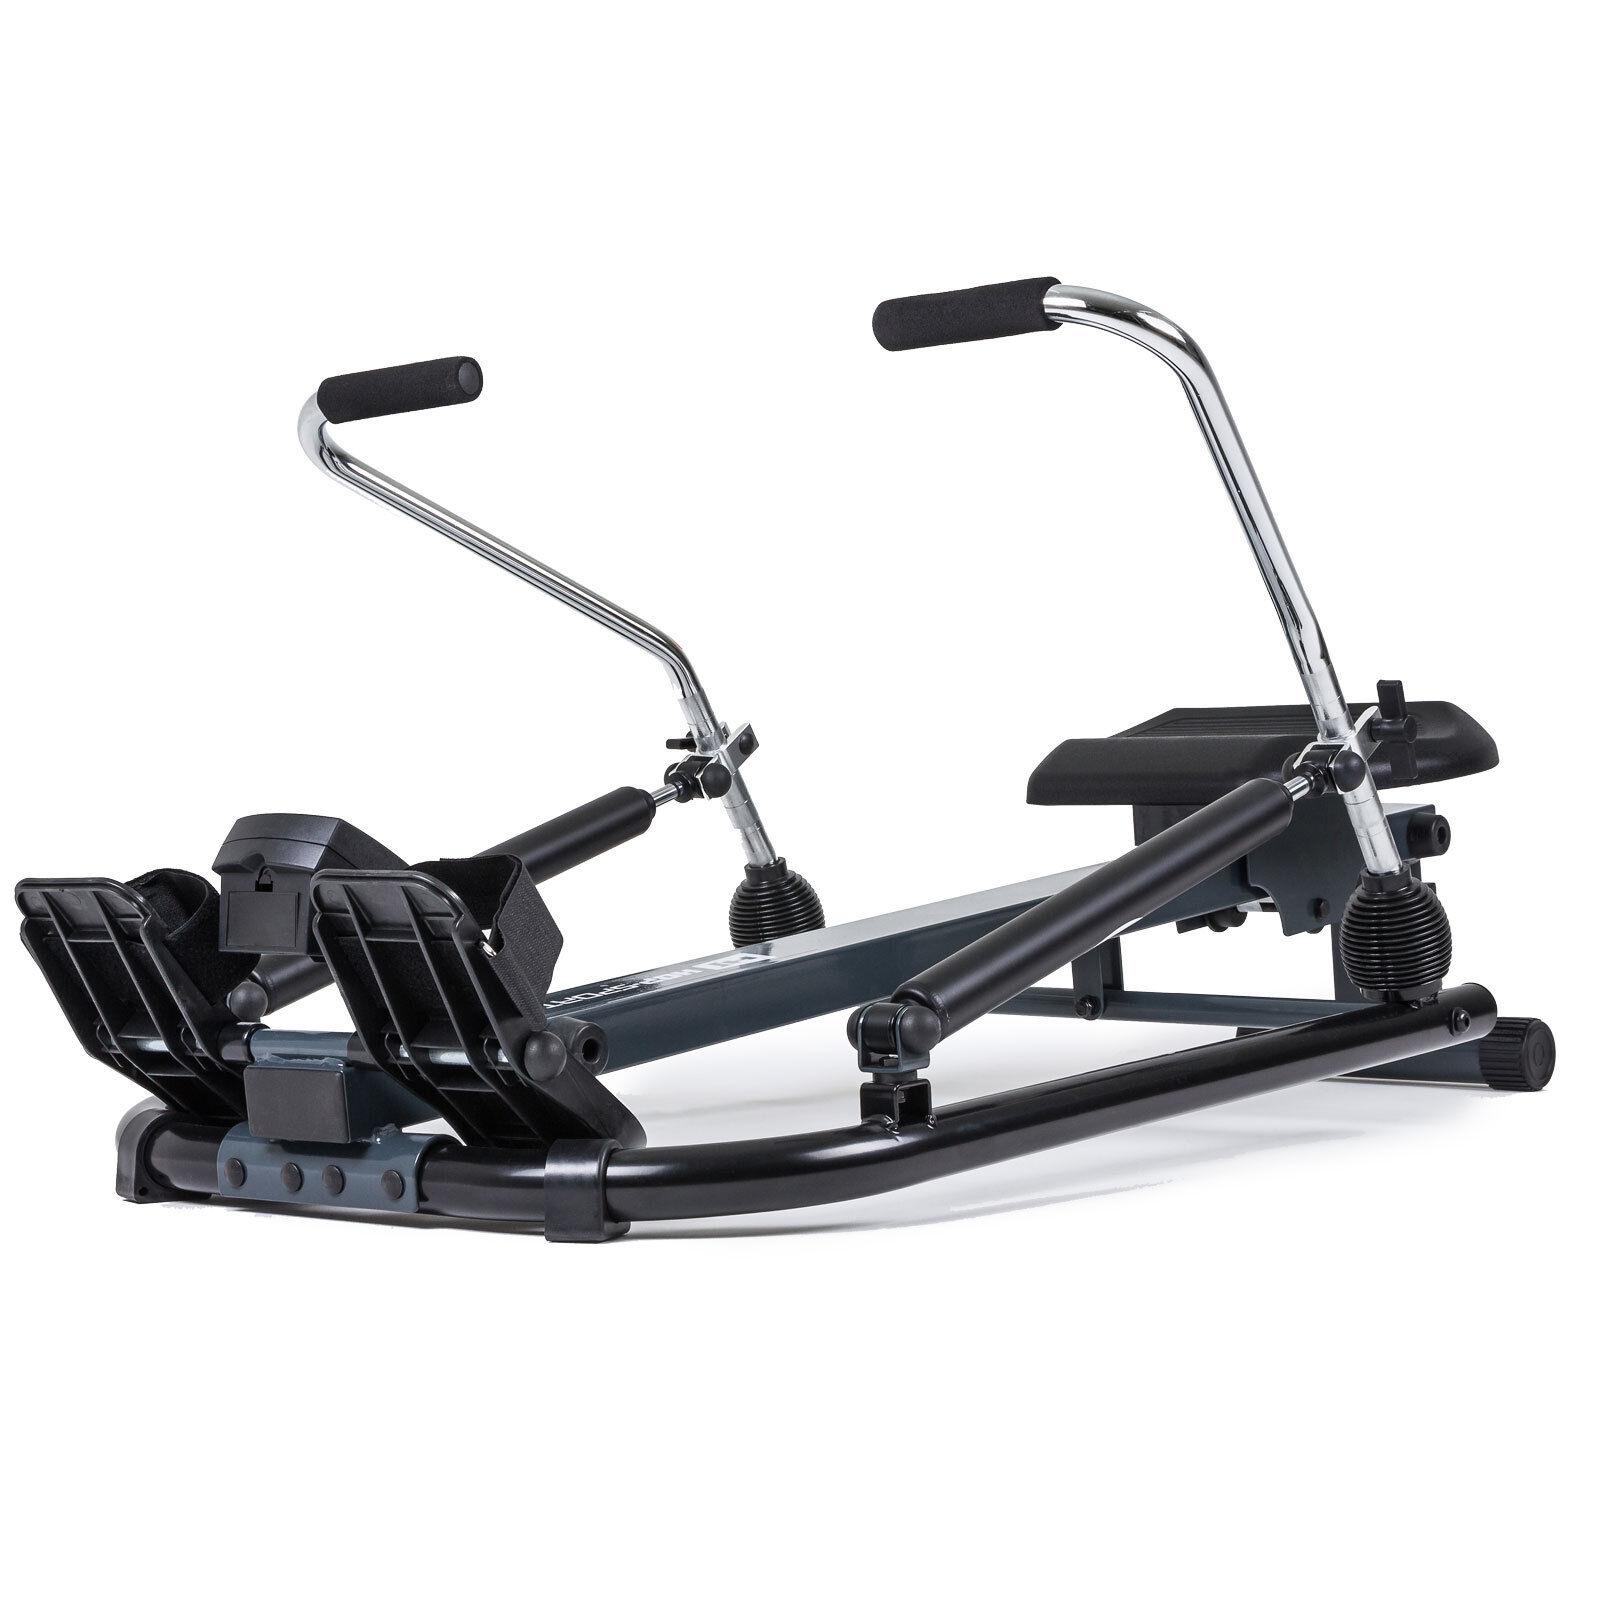 Rudergerät WING Rudermaschine Fitnessgerät inkl. Computer verstellbare Sitzhöhe